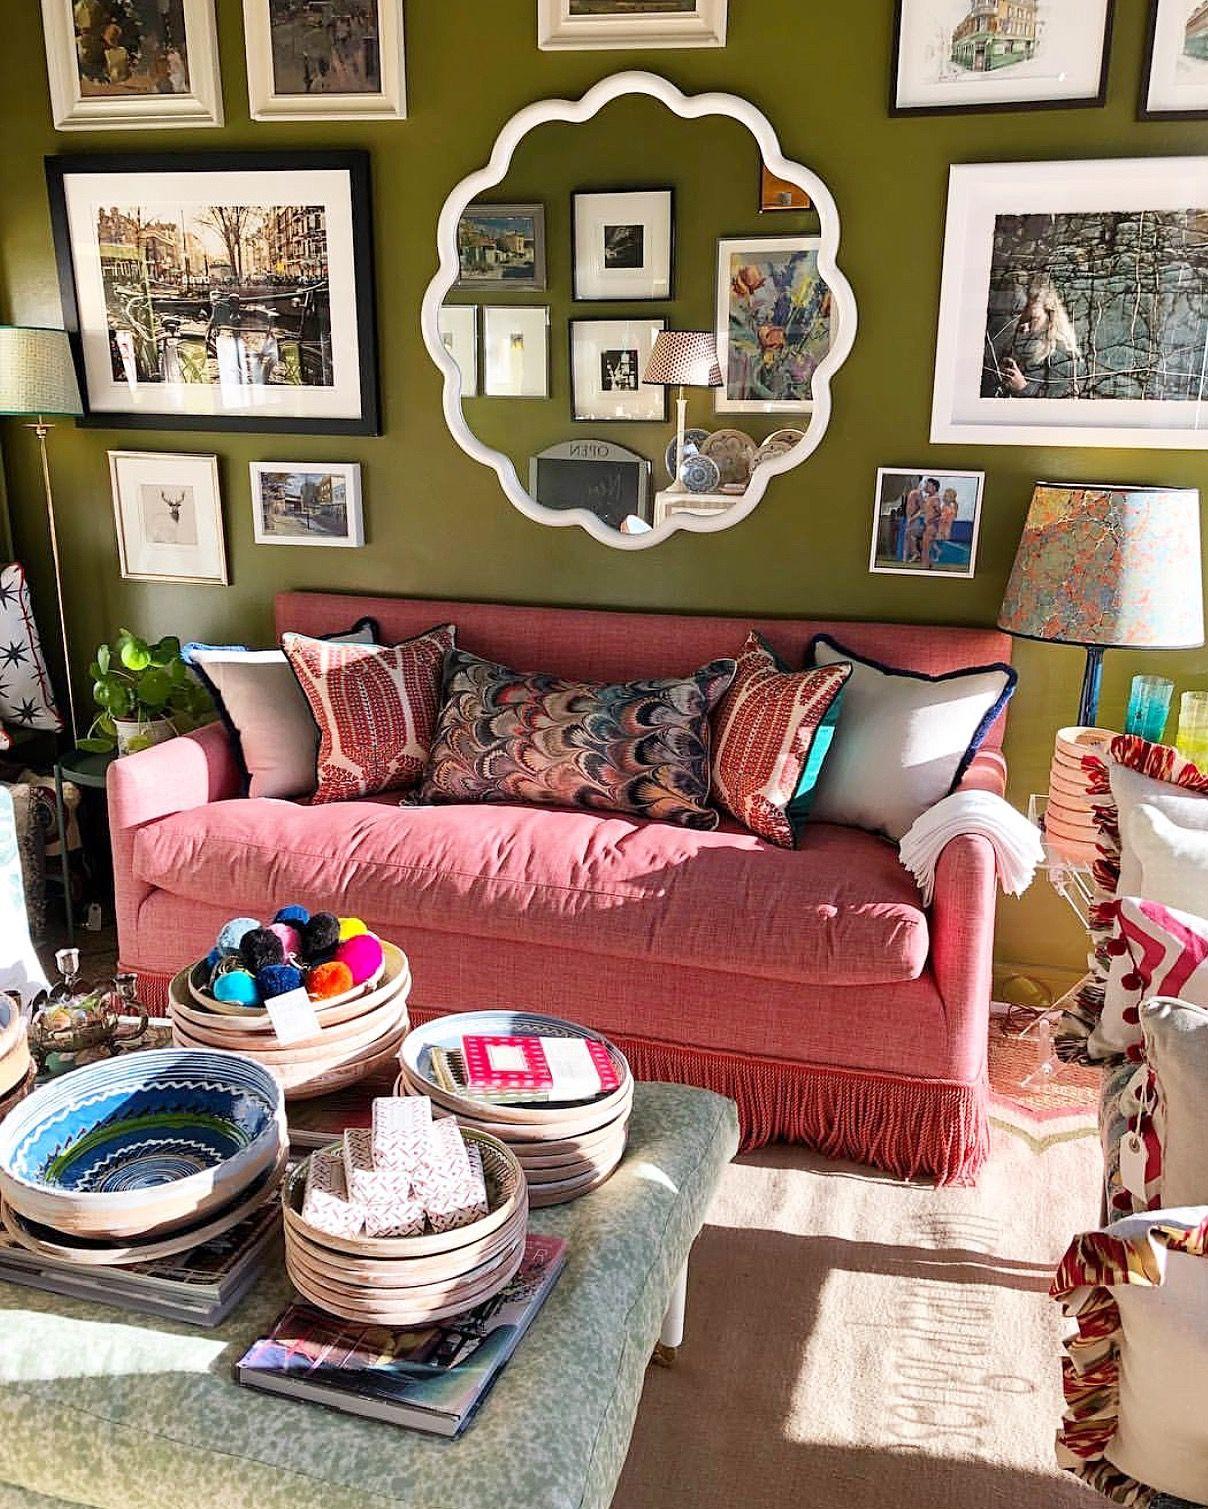 Decor , Diy Decor Projects, Home Decor